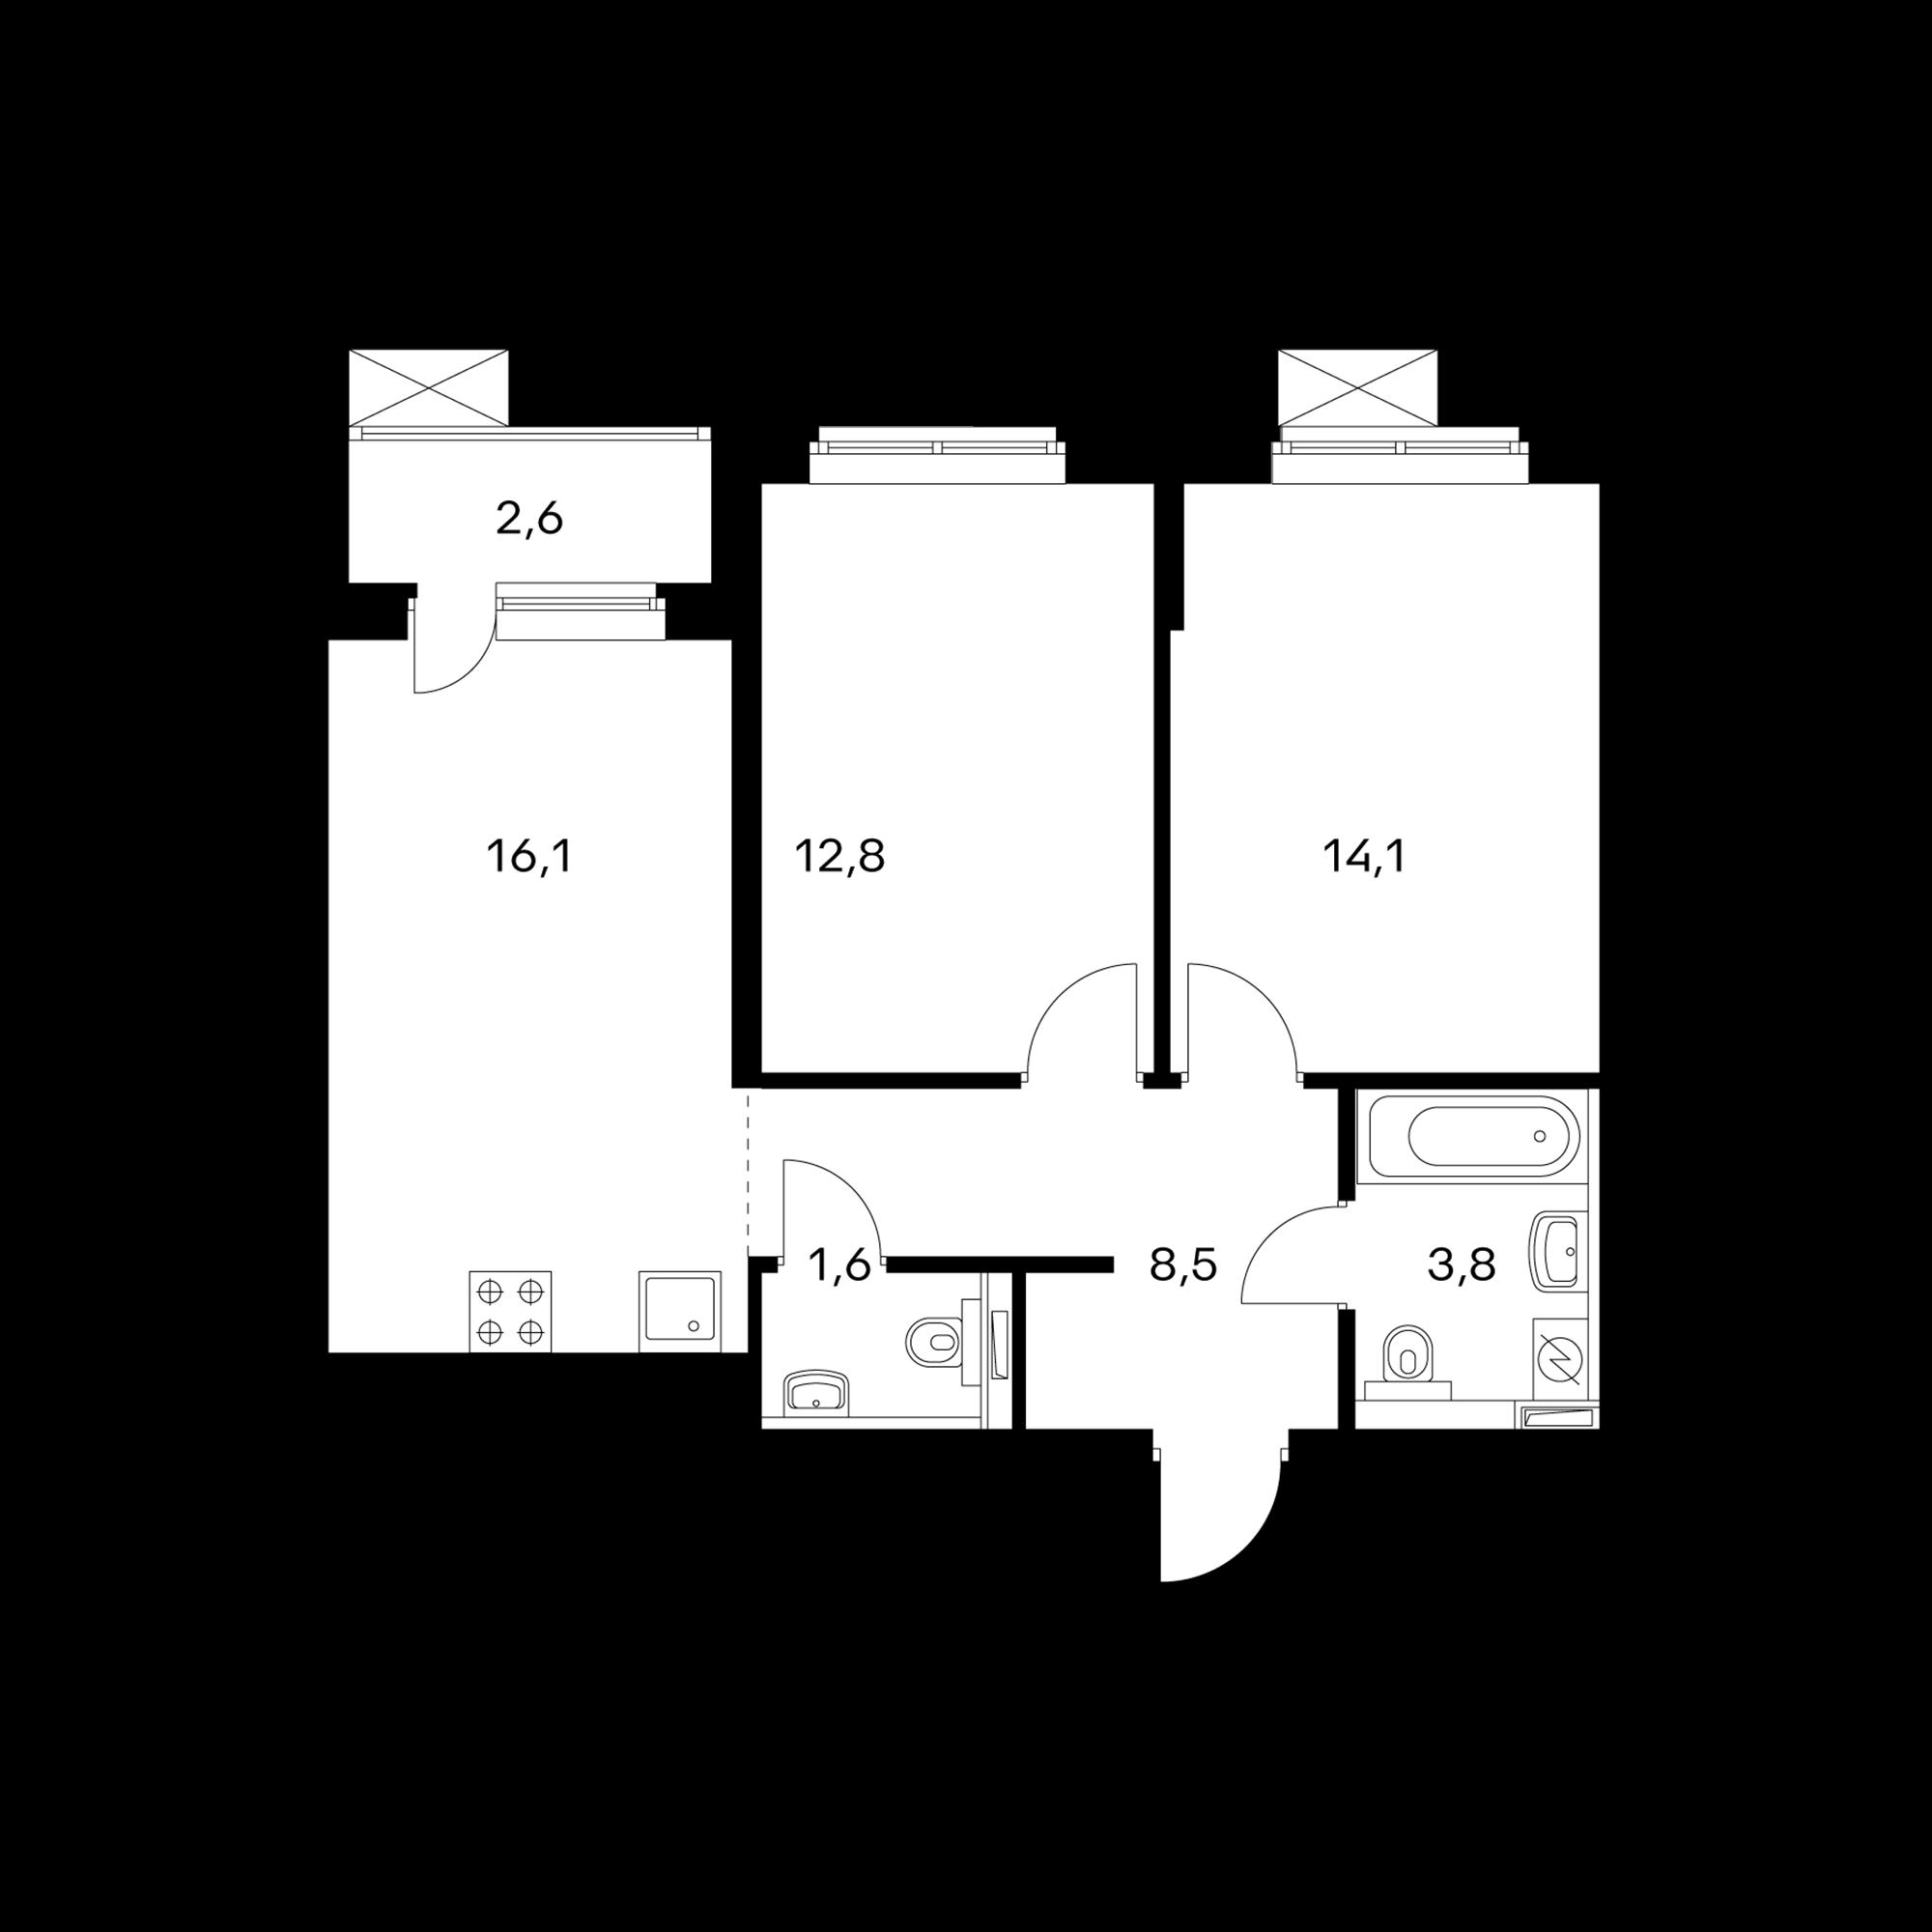 2EM8_9.6-1_S_AL